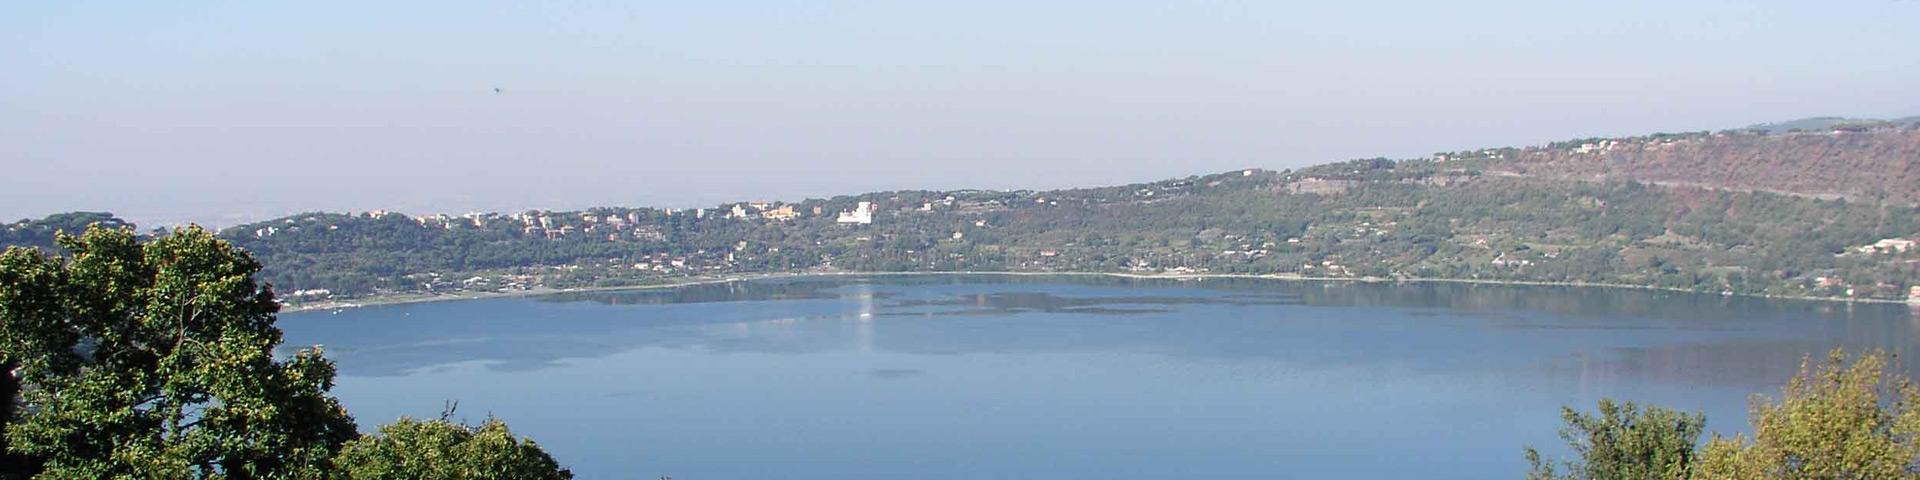 Panorama Albano Laziale